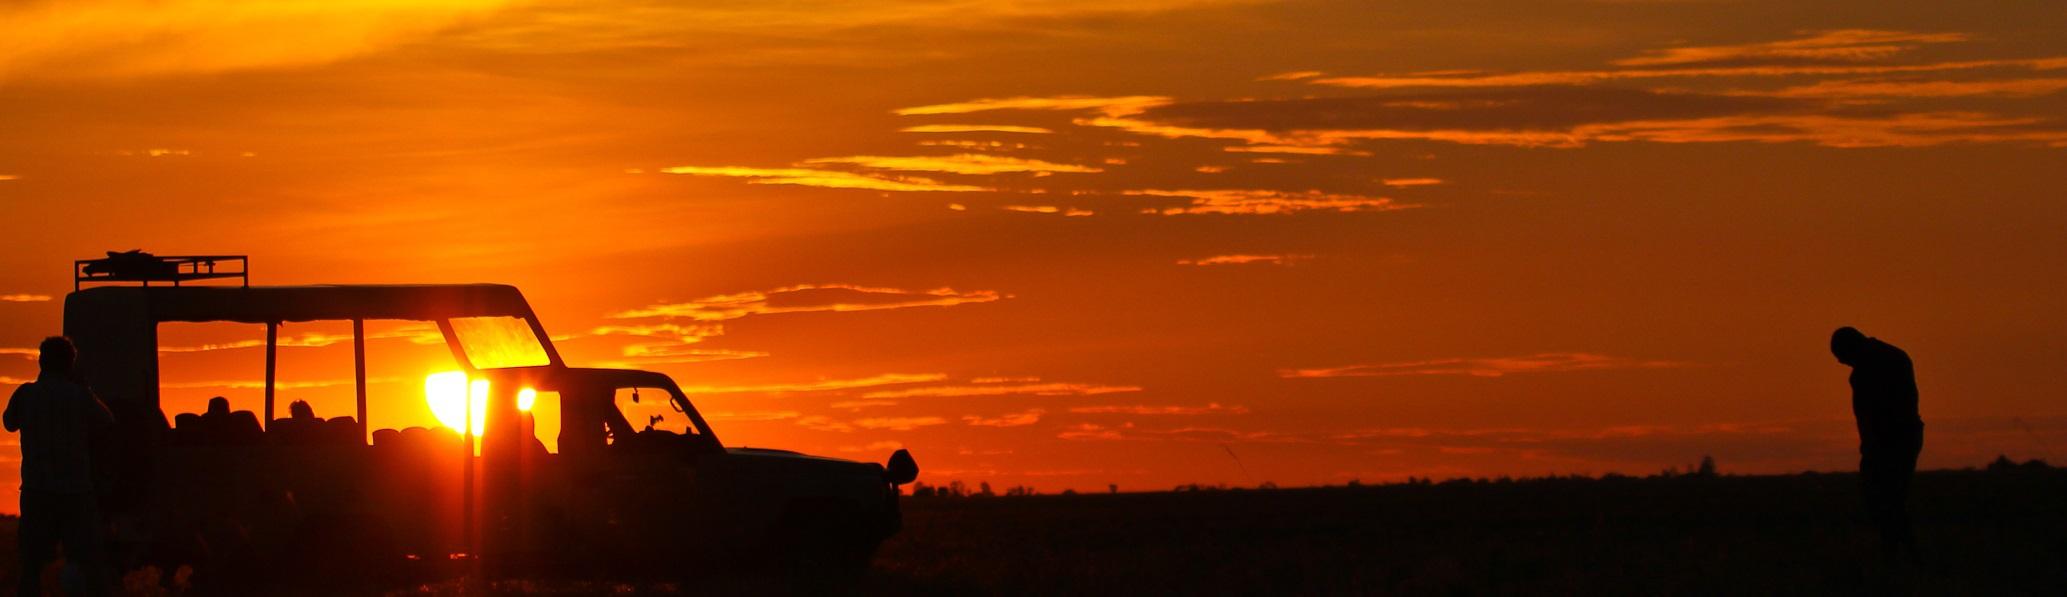 Jeep im Sonnenuntergang in Afrika